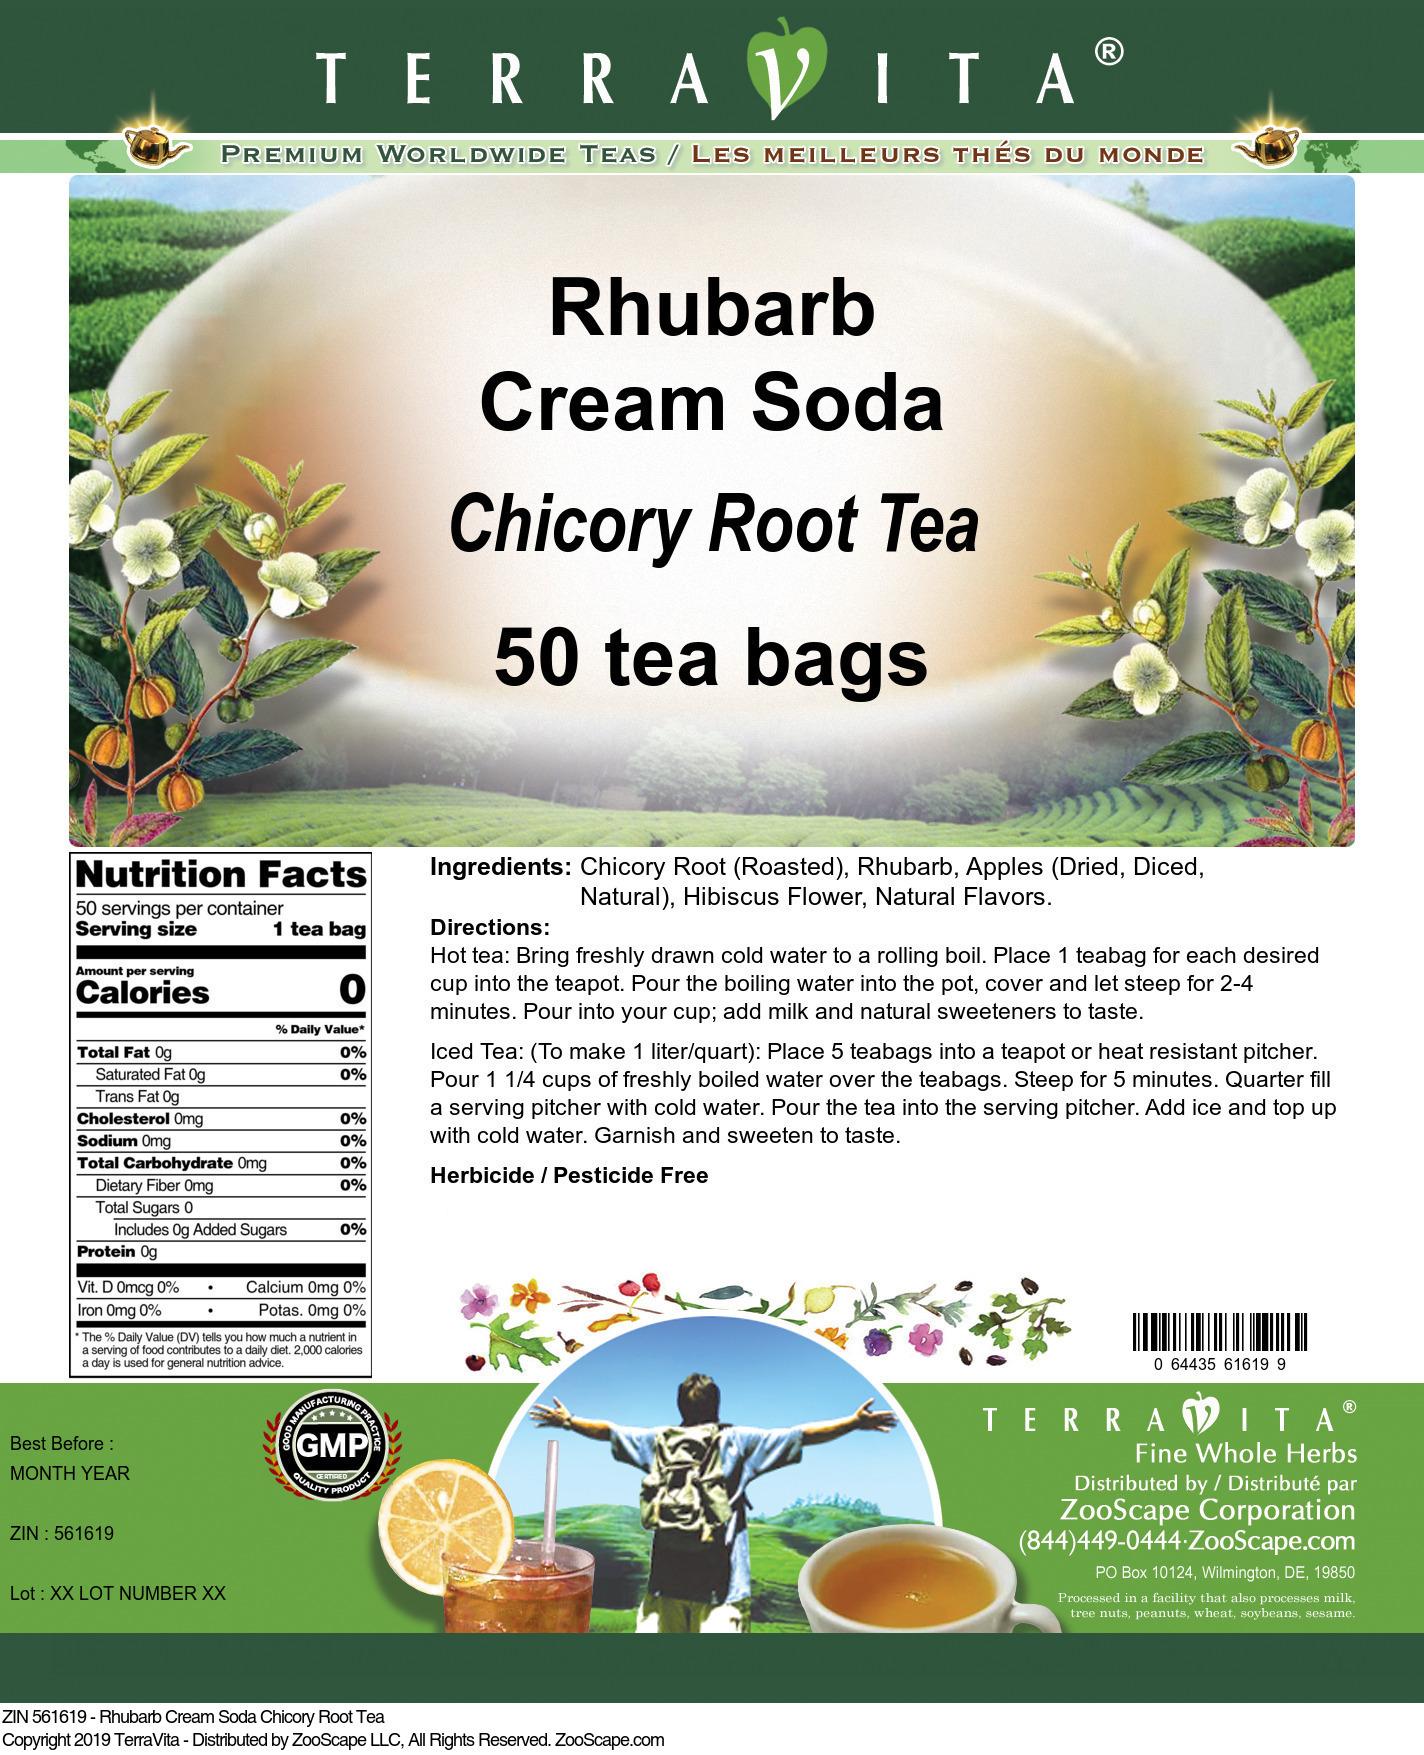 Rhubarb Cream Soda Chicory Root